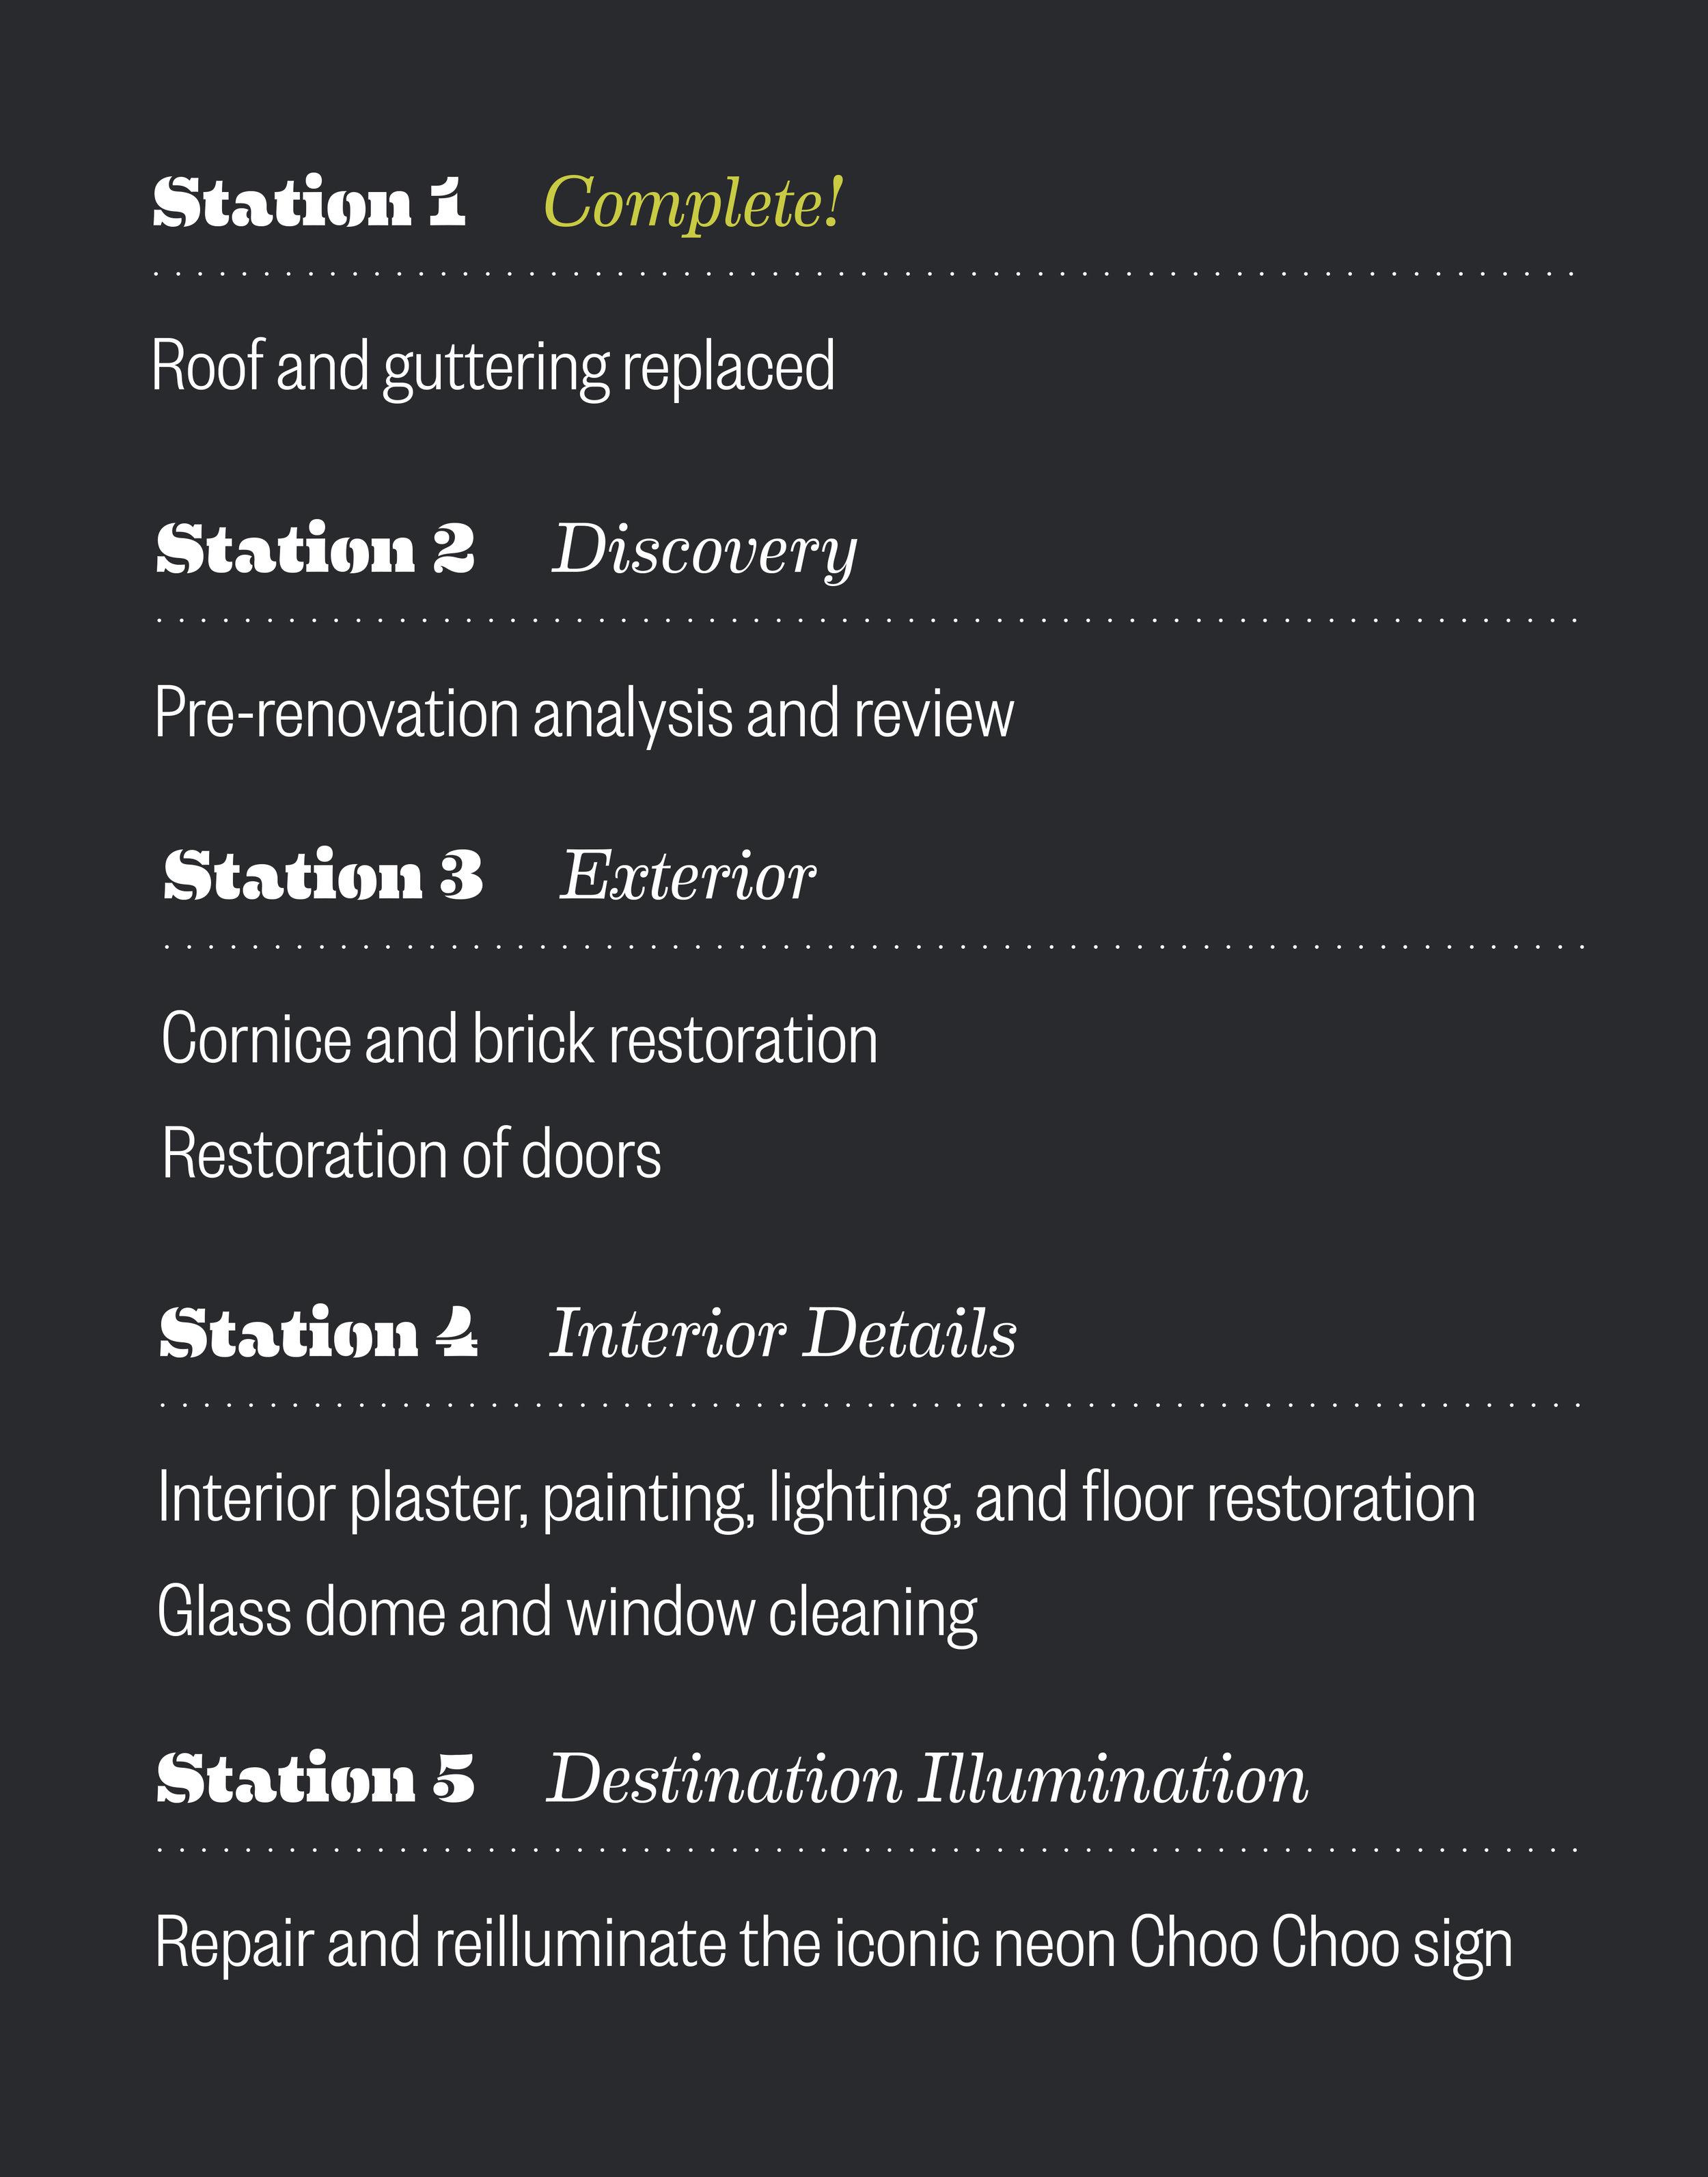 stations-2.jpg